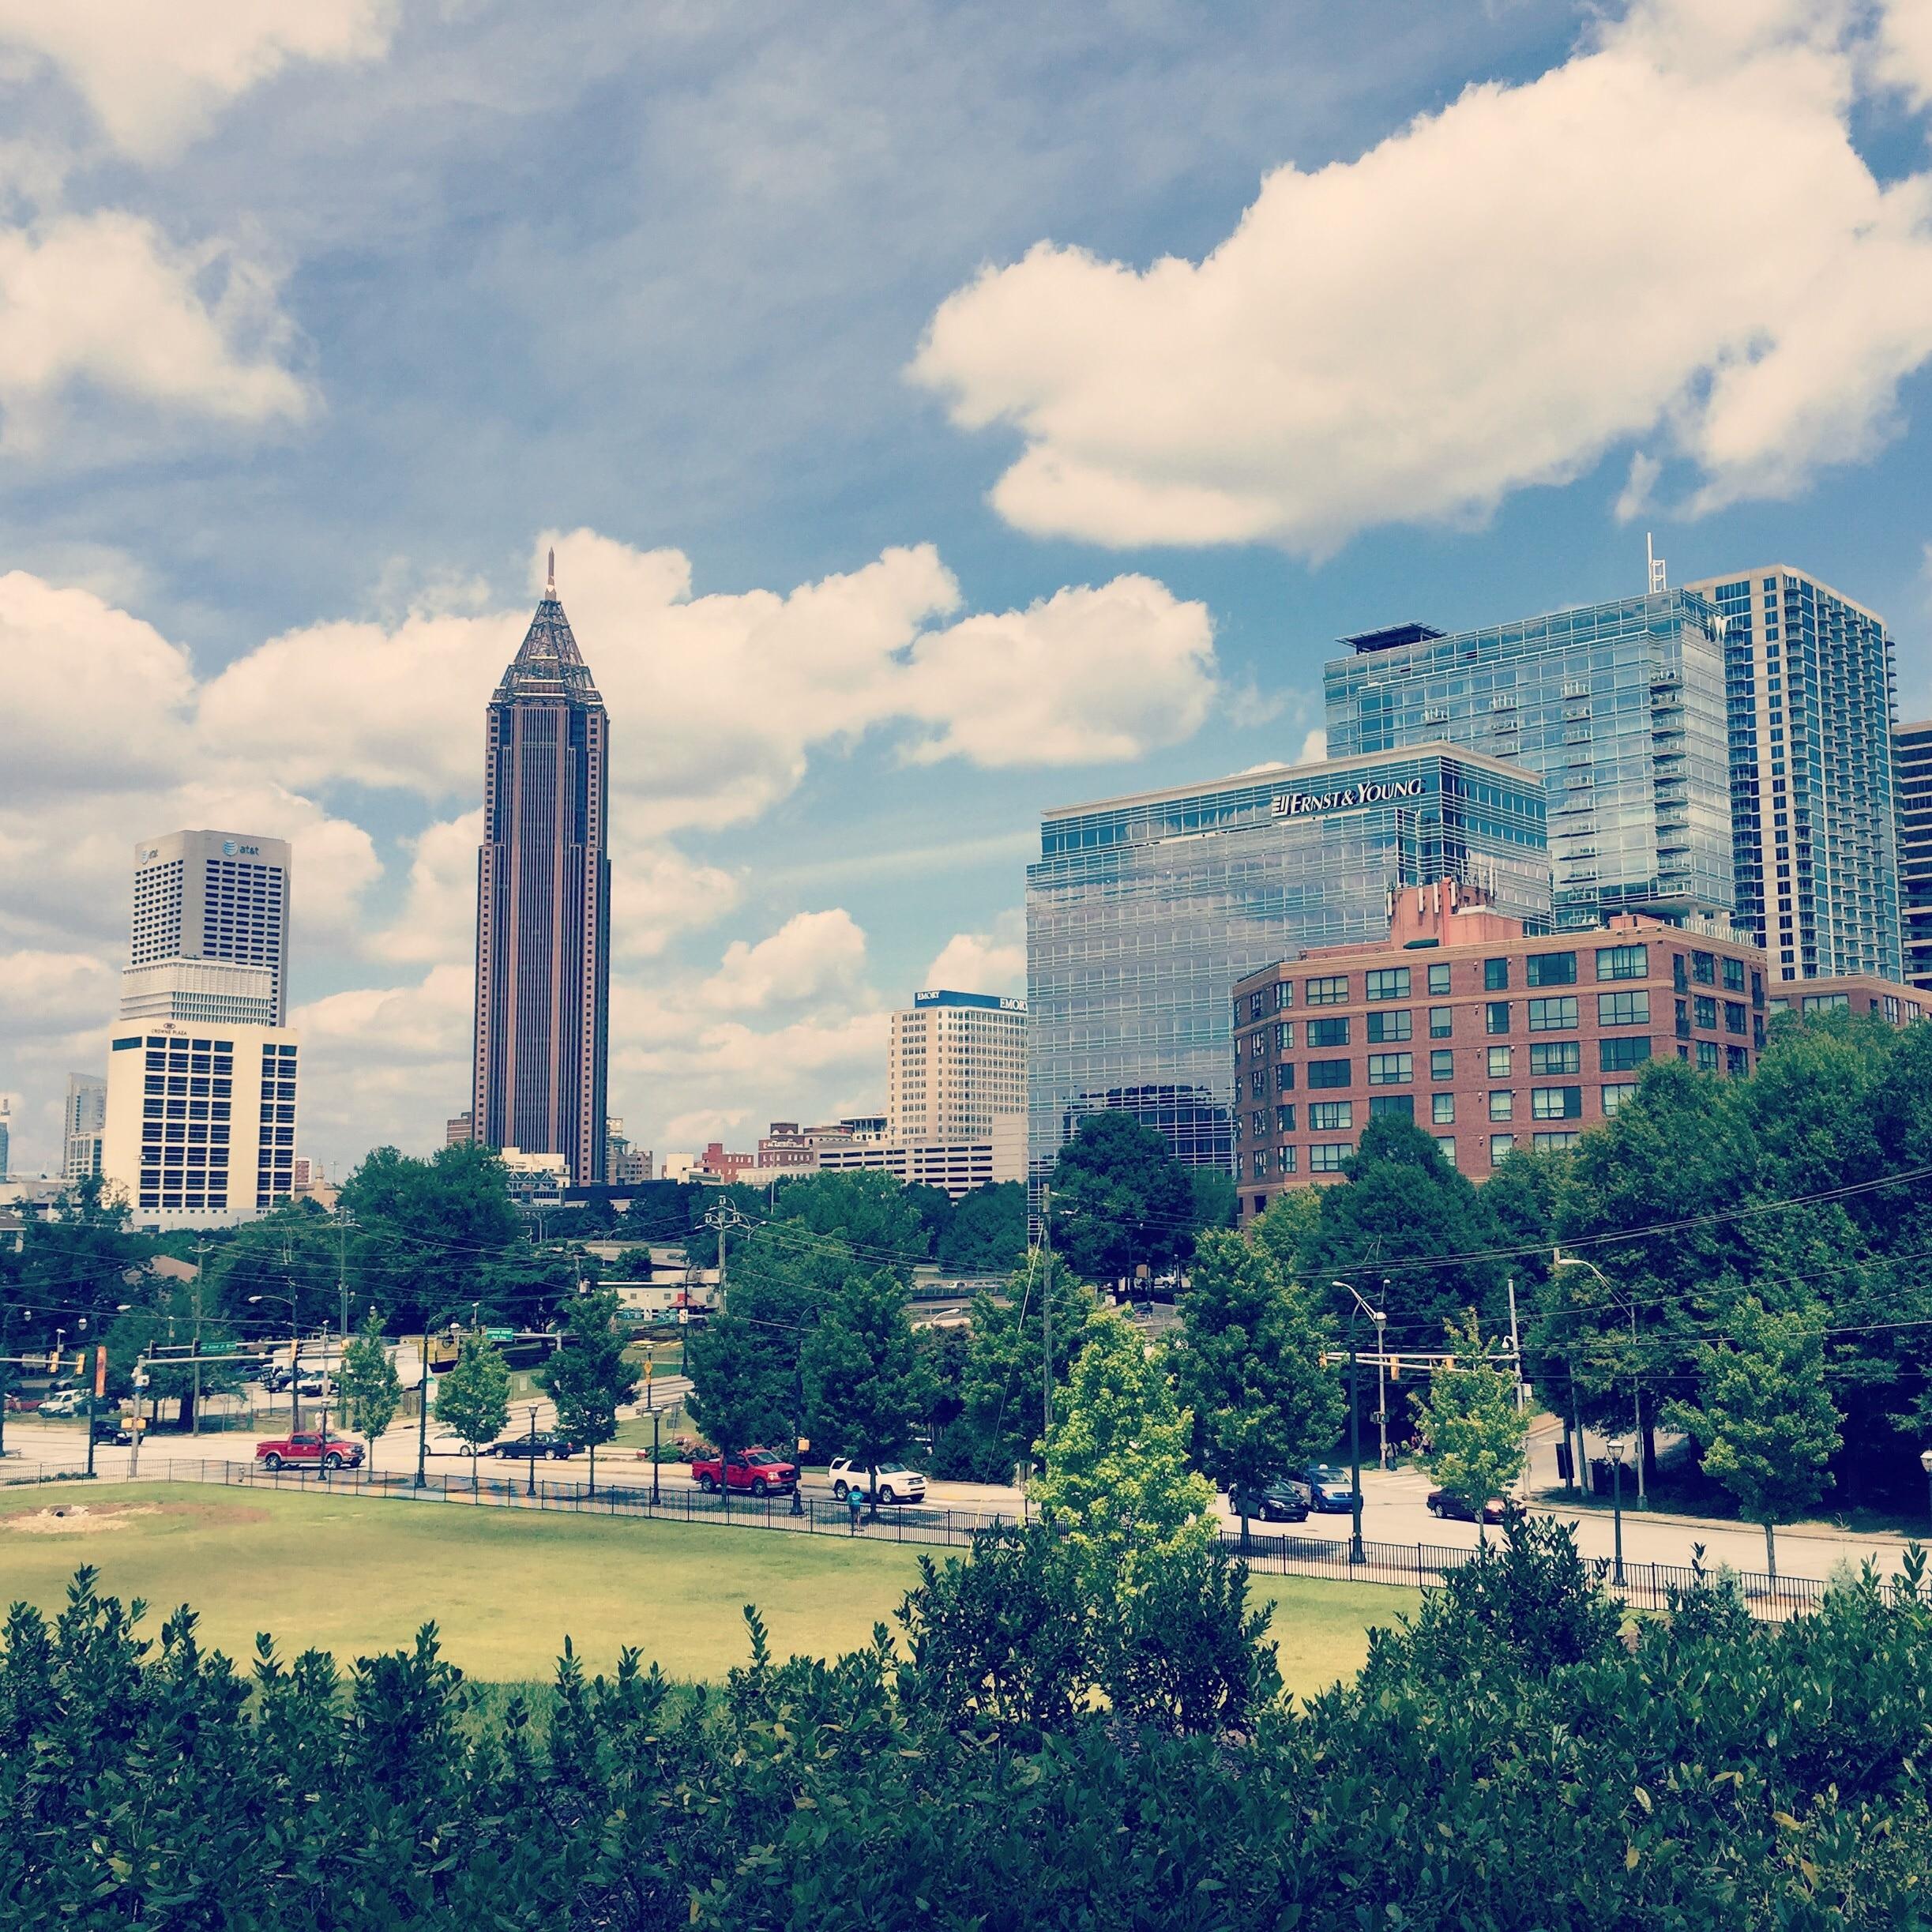 Home Park, Atlanta, Georgia, United States of America